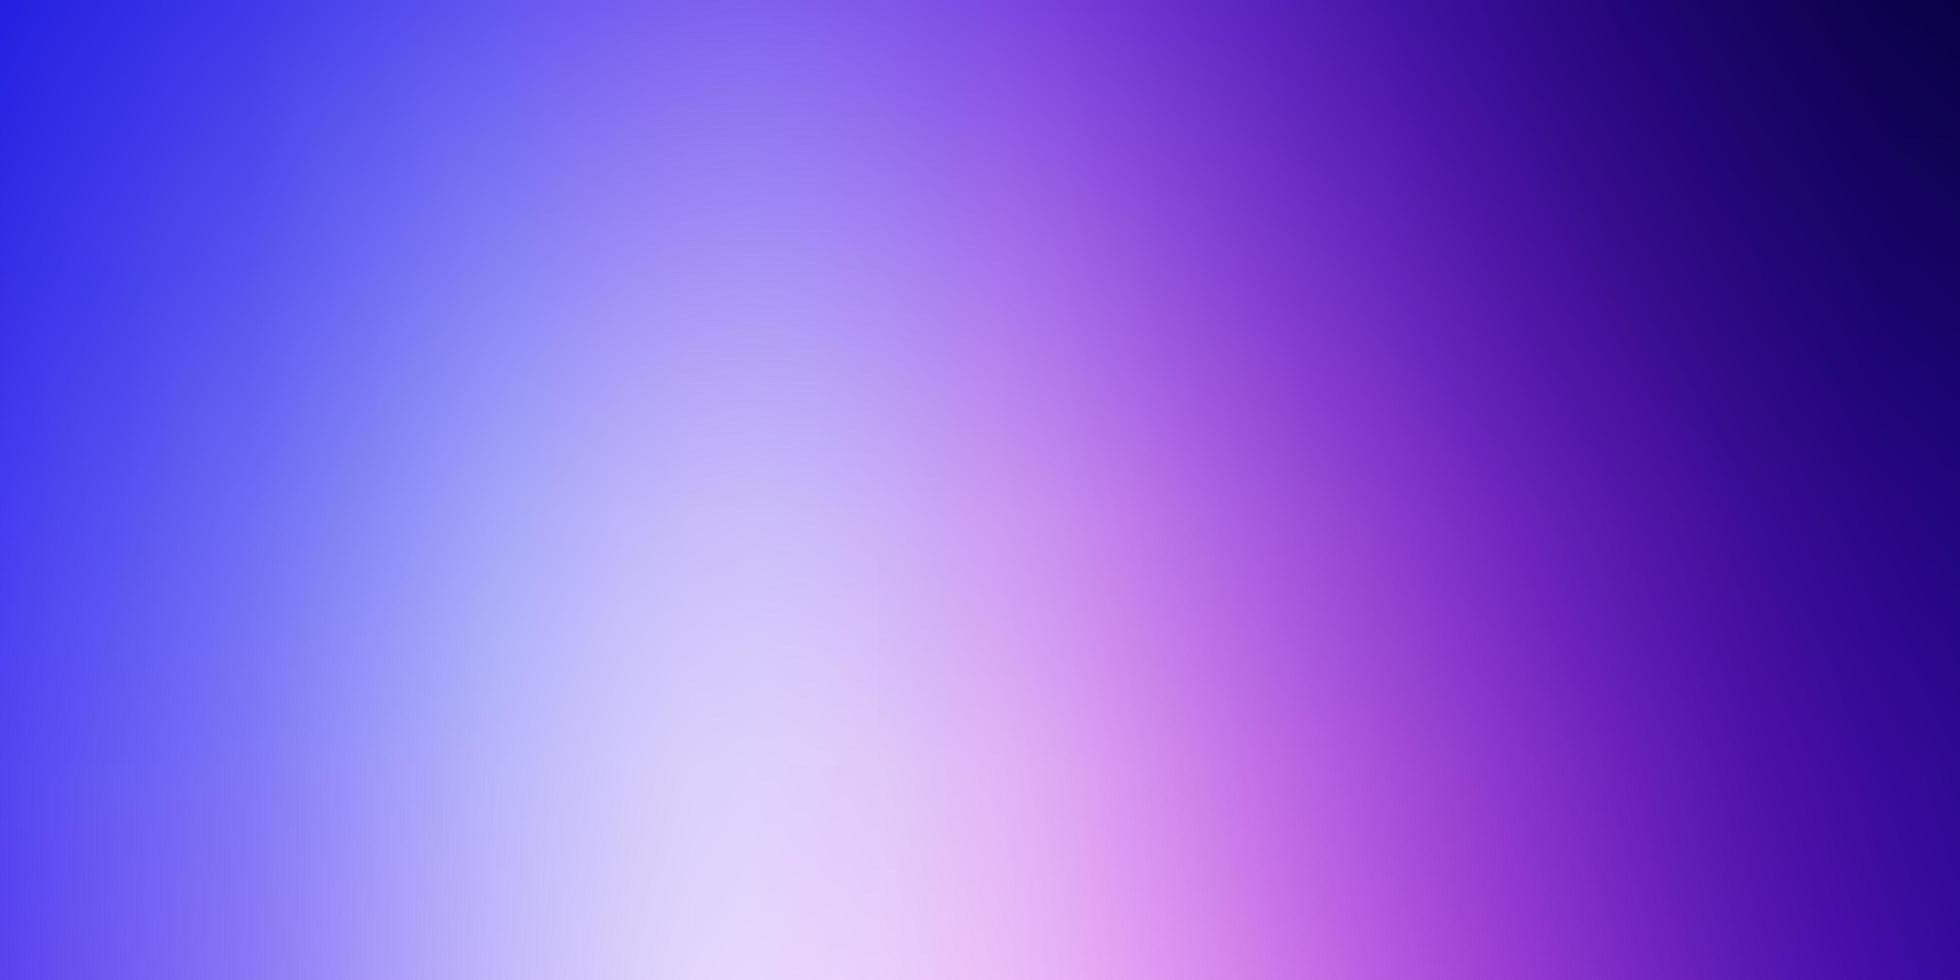 luz roxa vector turva fundo colorido.